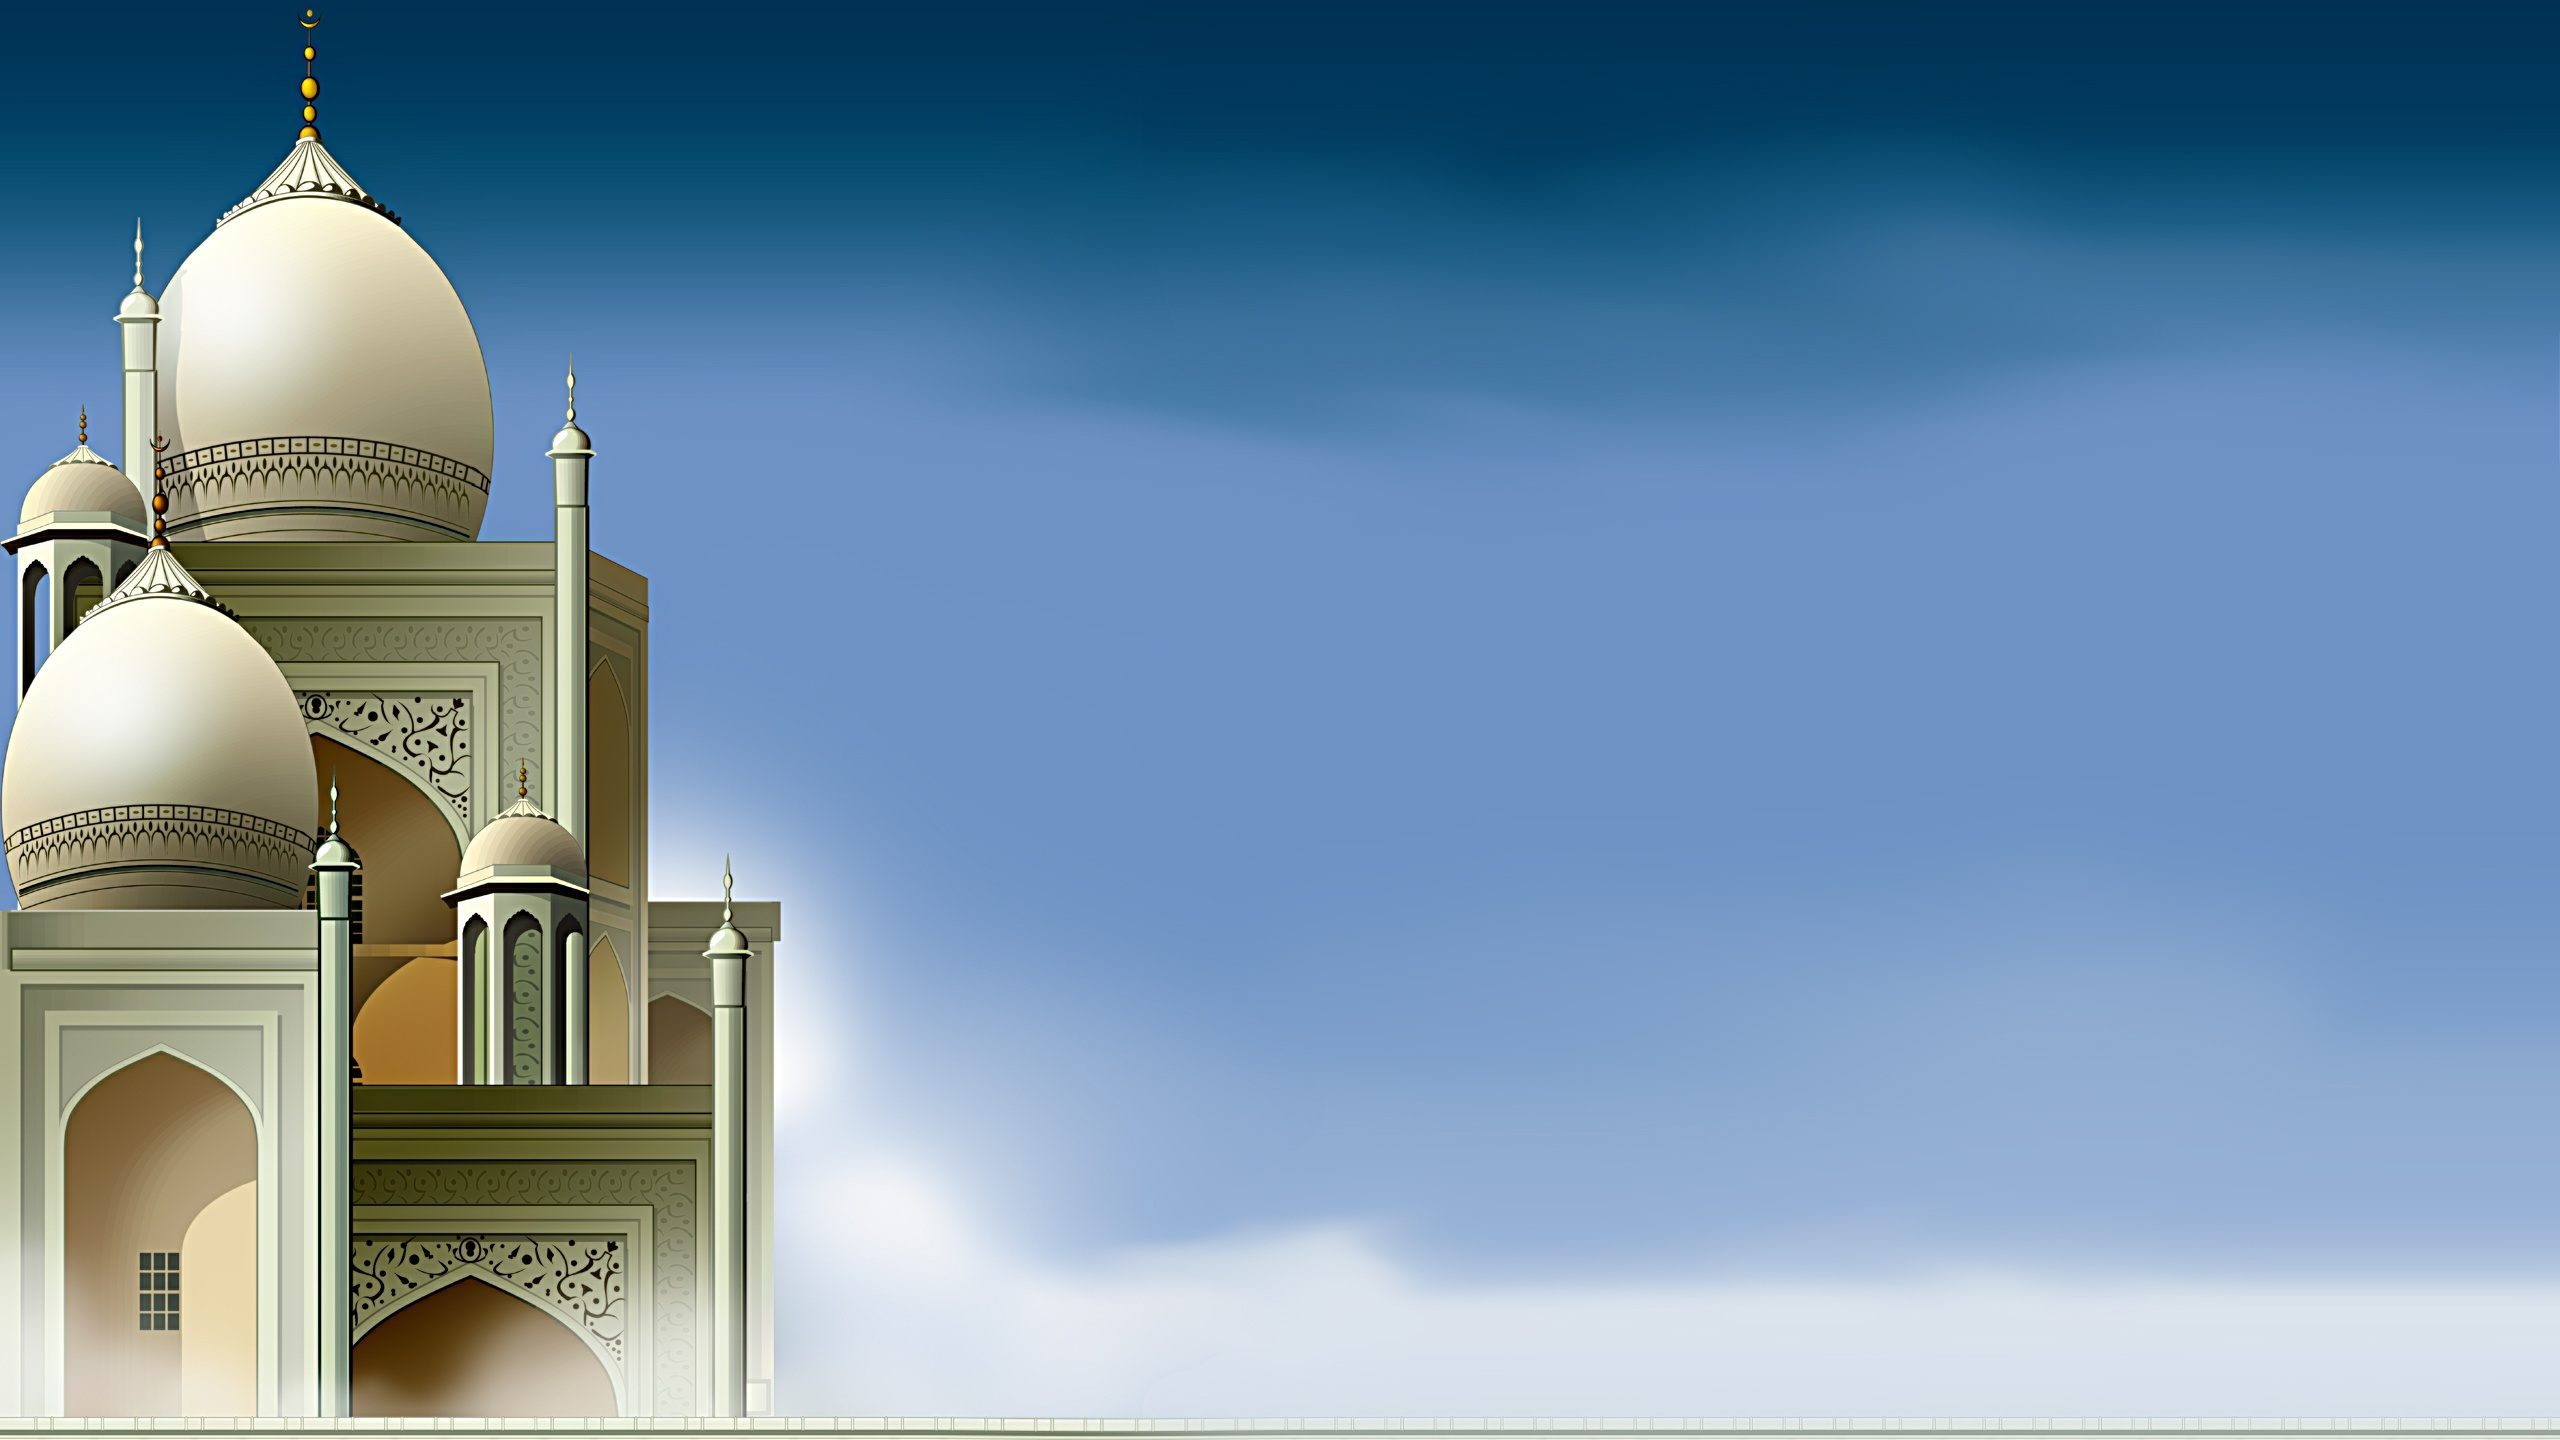 Islamic Pictures Hd 2560x1440 Wallpaper Teahub Io